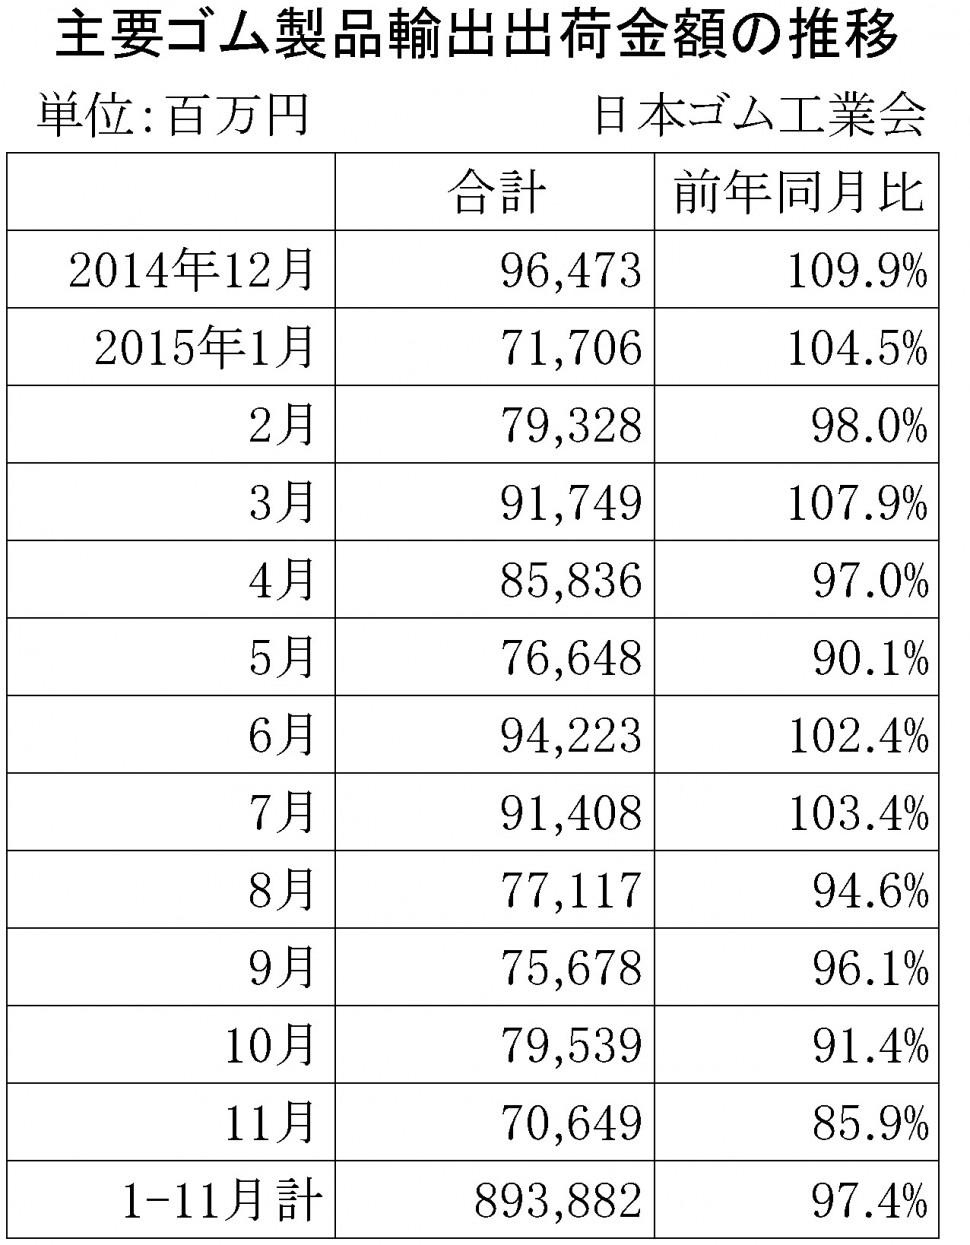 2015年11月ゴム製品輸出金額